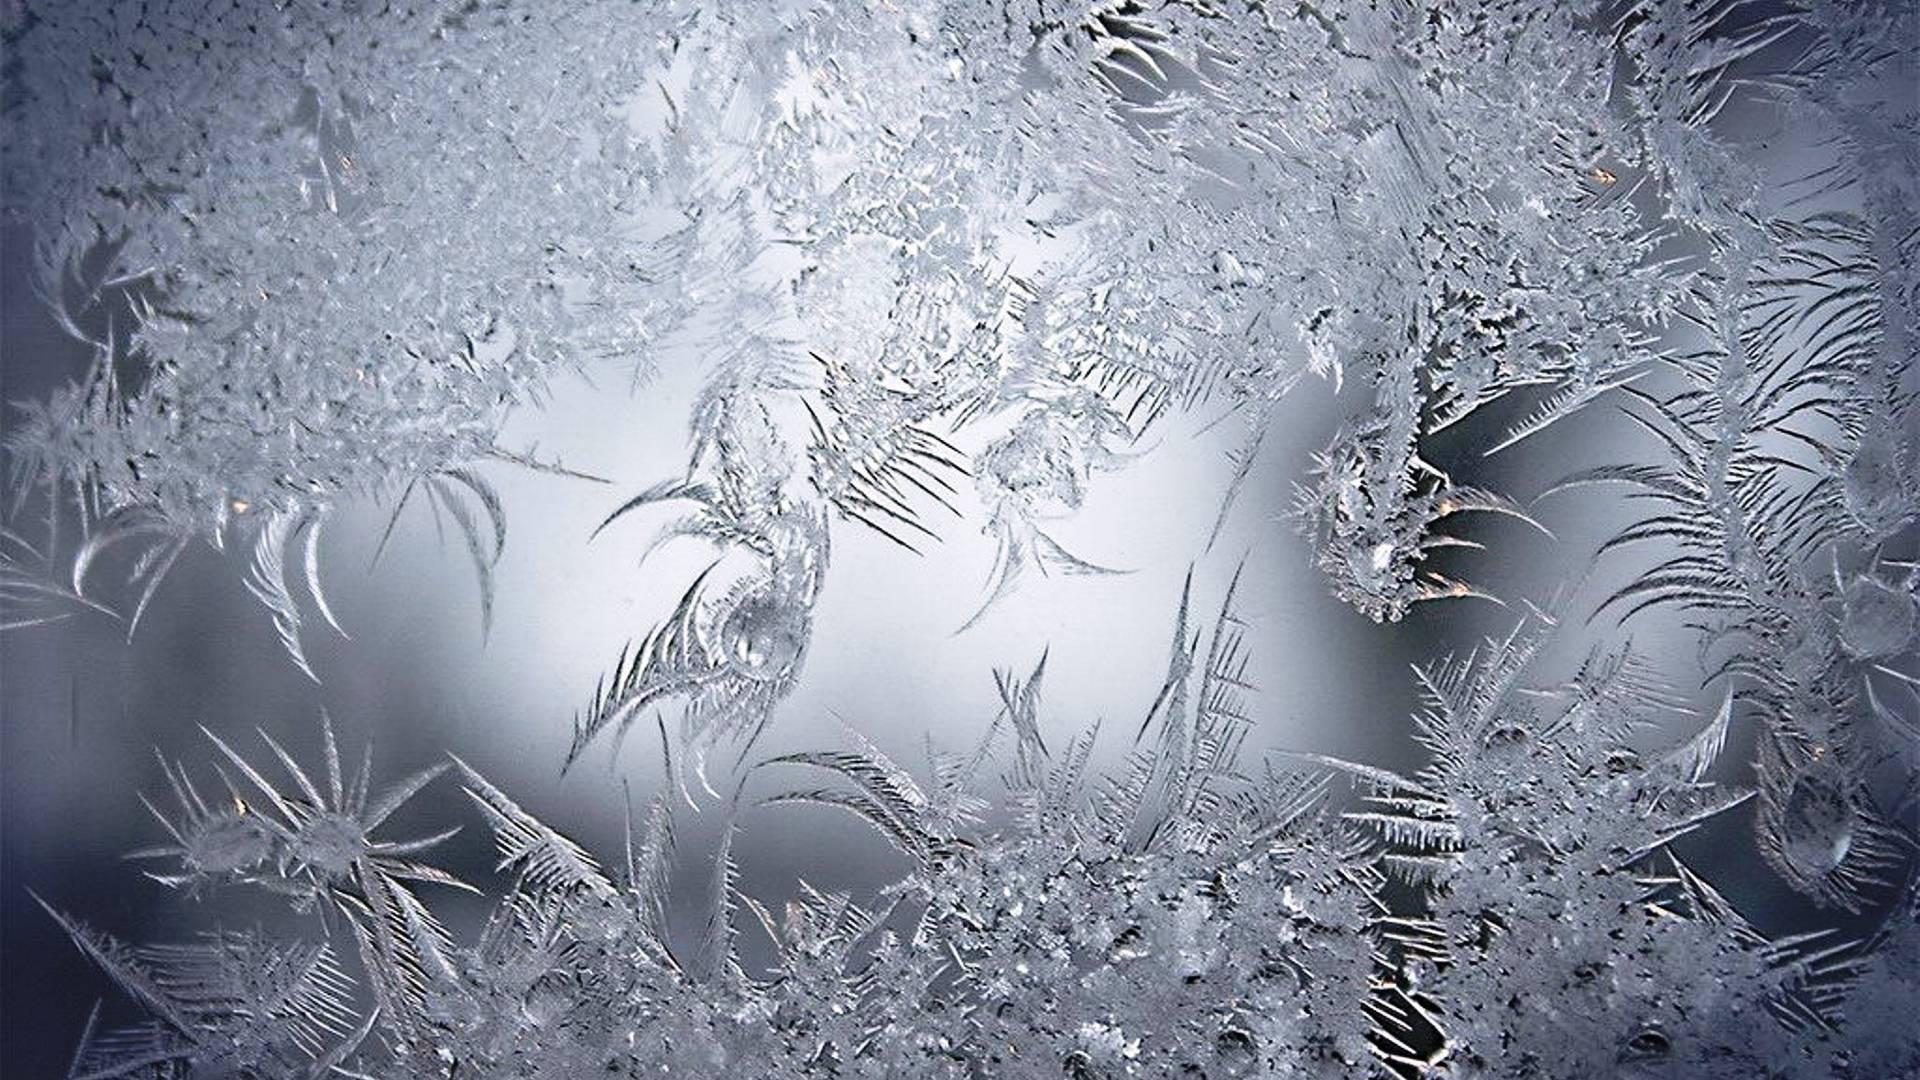 обои стекло, обледенение, лед, рисунок картинки фото